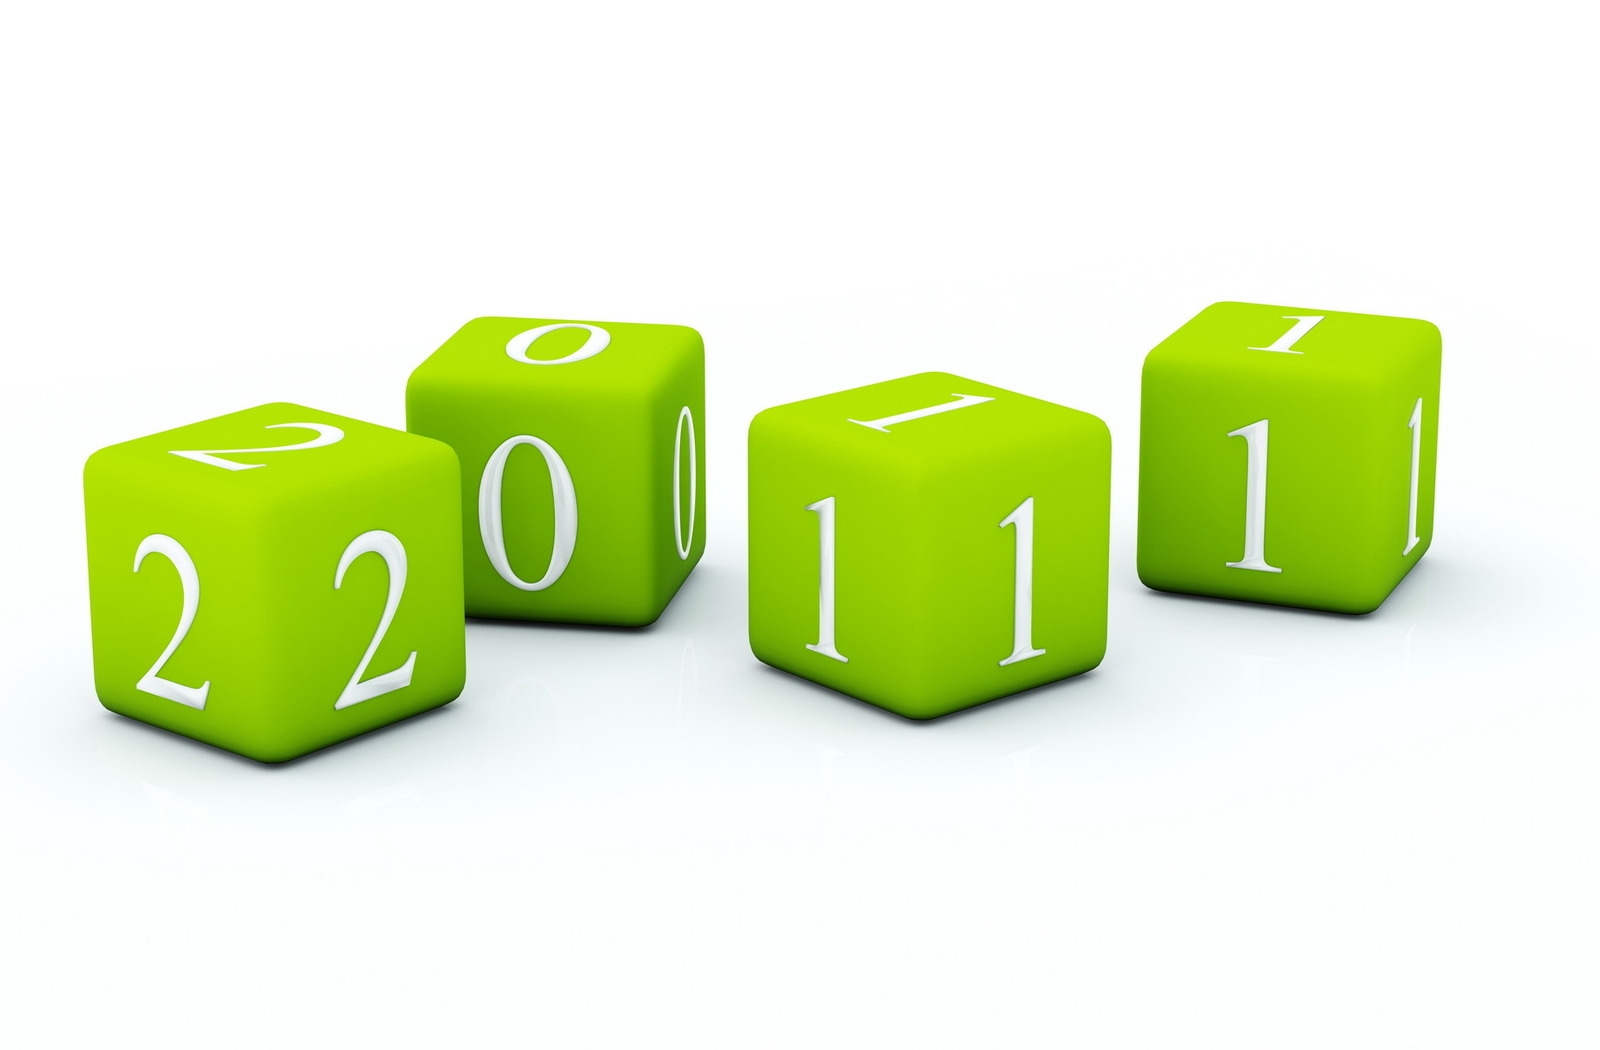 http://3.bp.blogspot.com/_l-o-Y5g4yyI/TR3XnrzXtBI/AAAAAAAAAWI/X7DUrxlc-7U/s1600/2011-happy-new-year-wallpaper-6.jpg